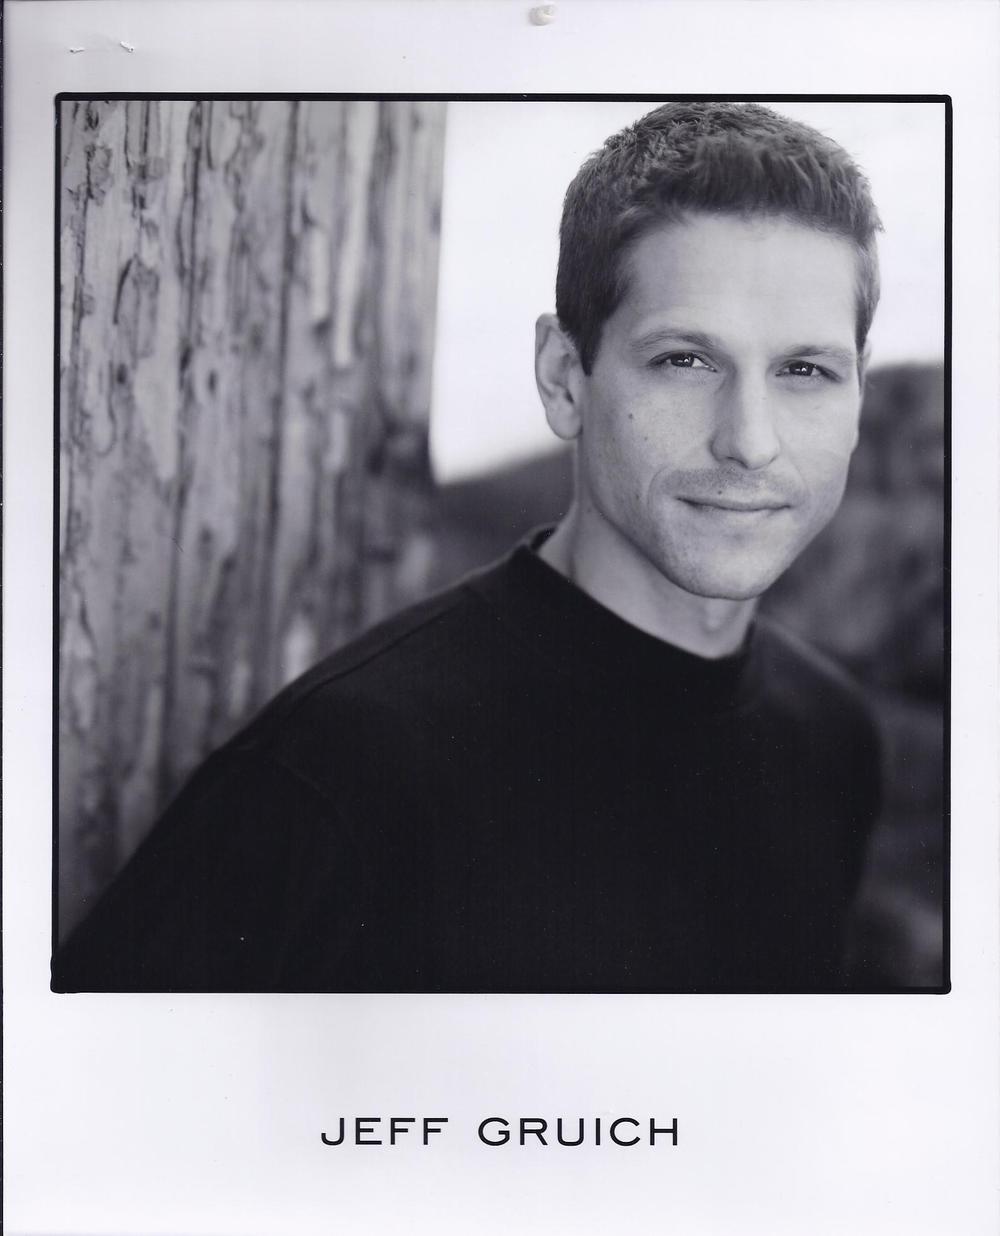 Jeff Gruich